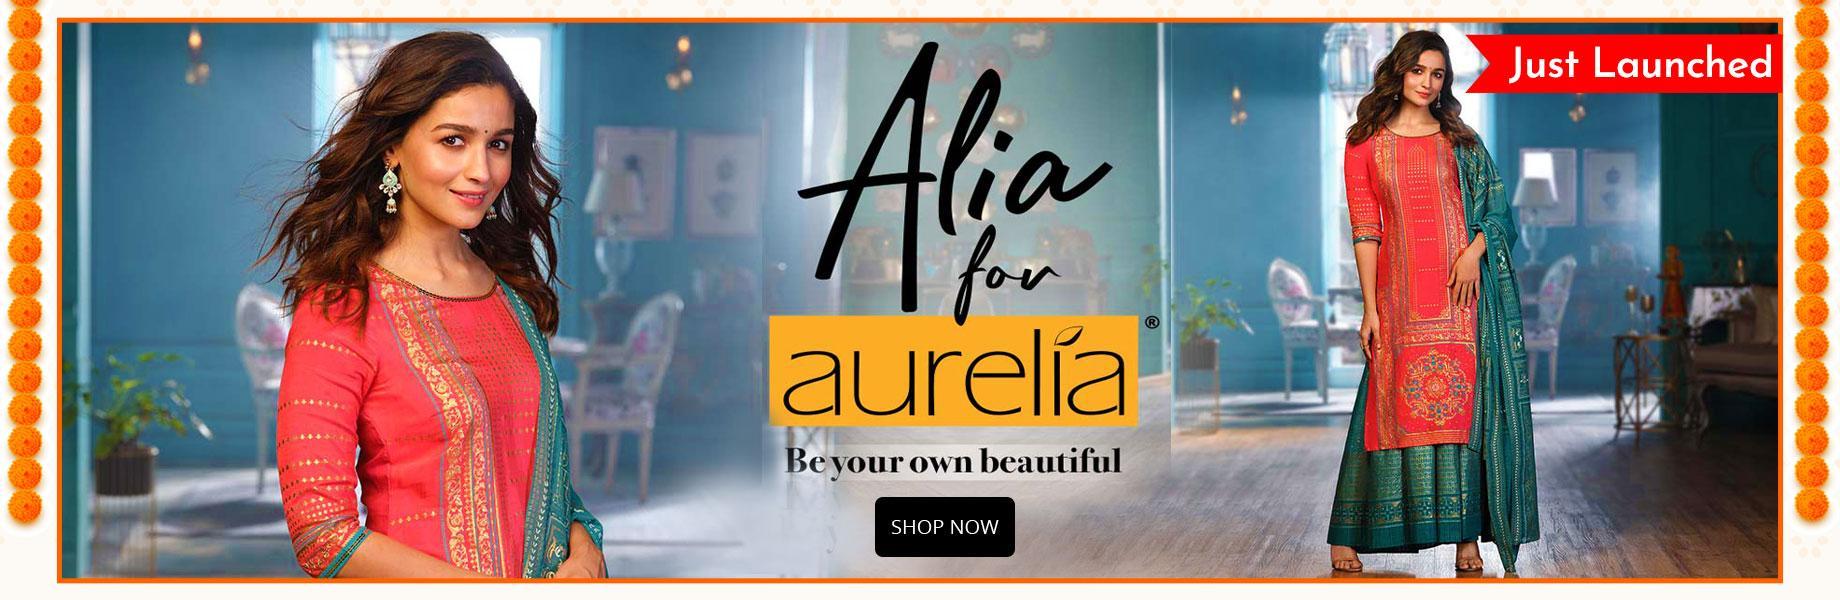 Web_Homepage-Carousel-Aurelia_20211024.jpg